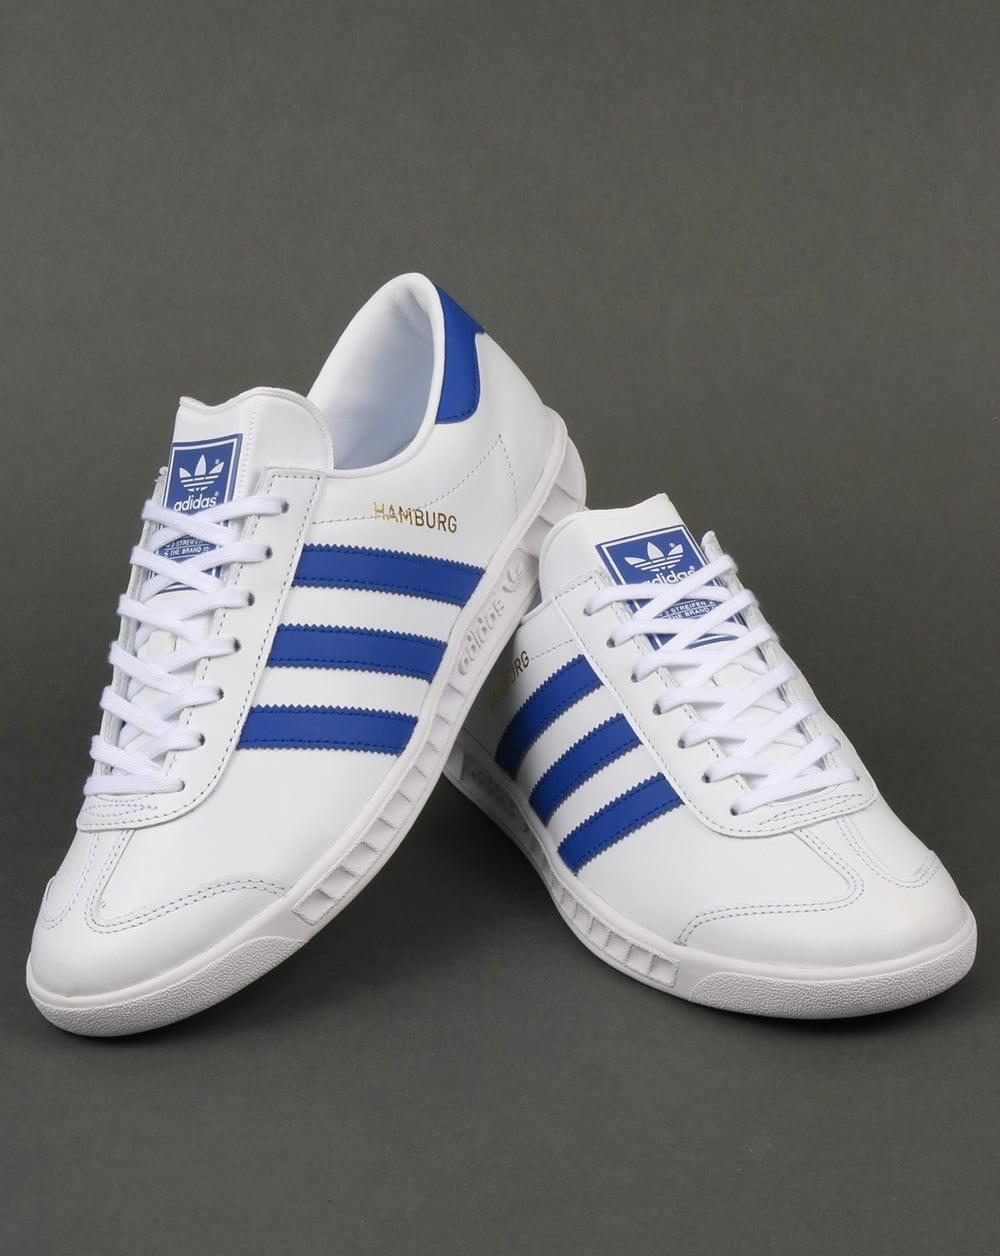 Adidas Hamburg Trainers White/Bold Blue